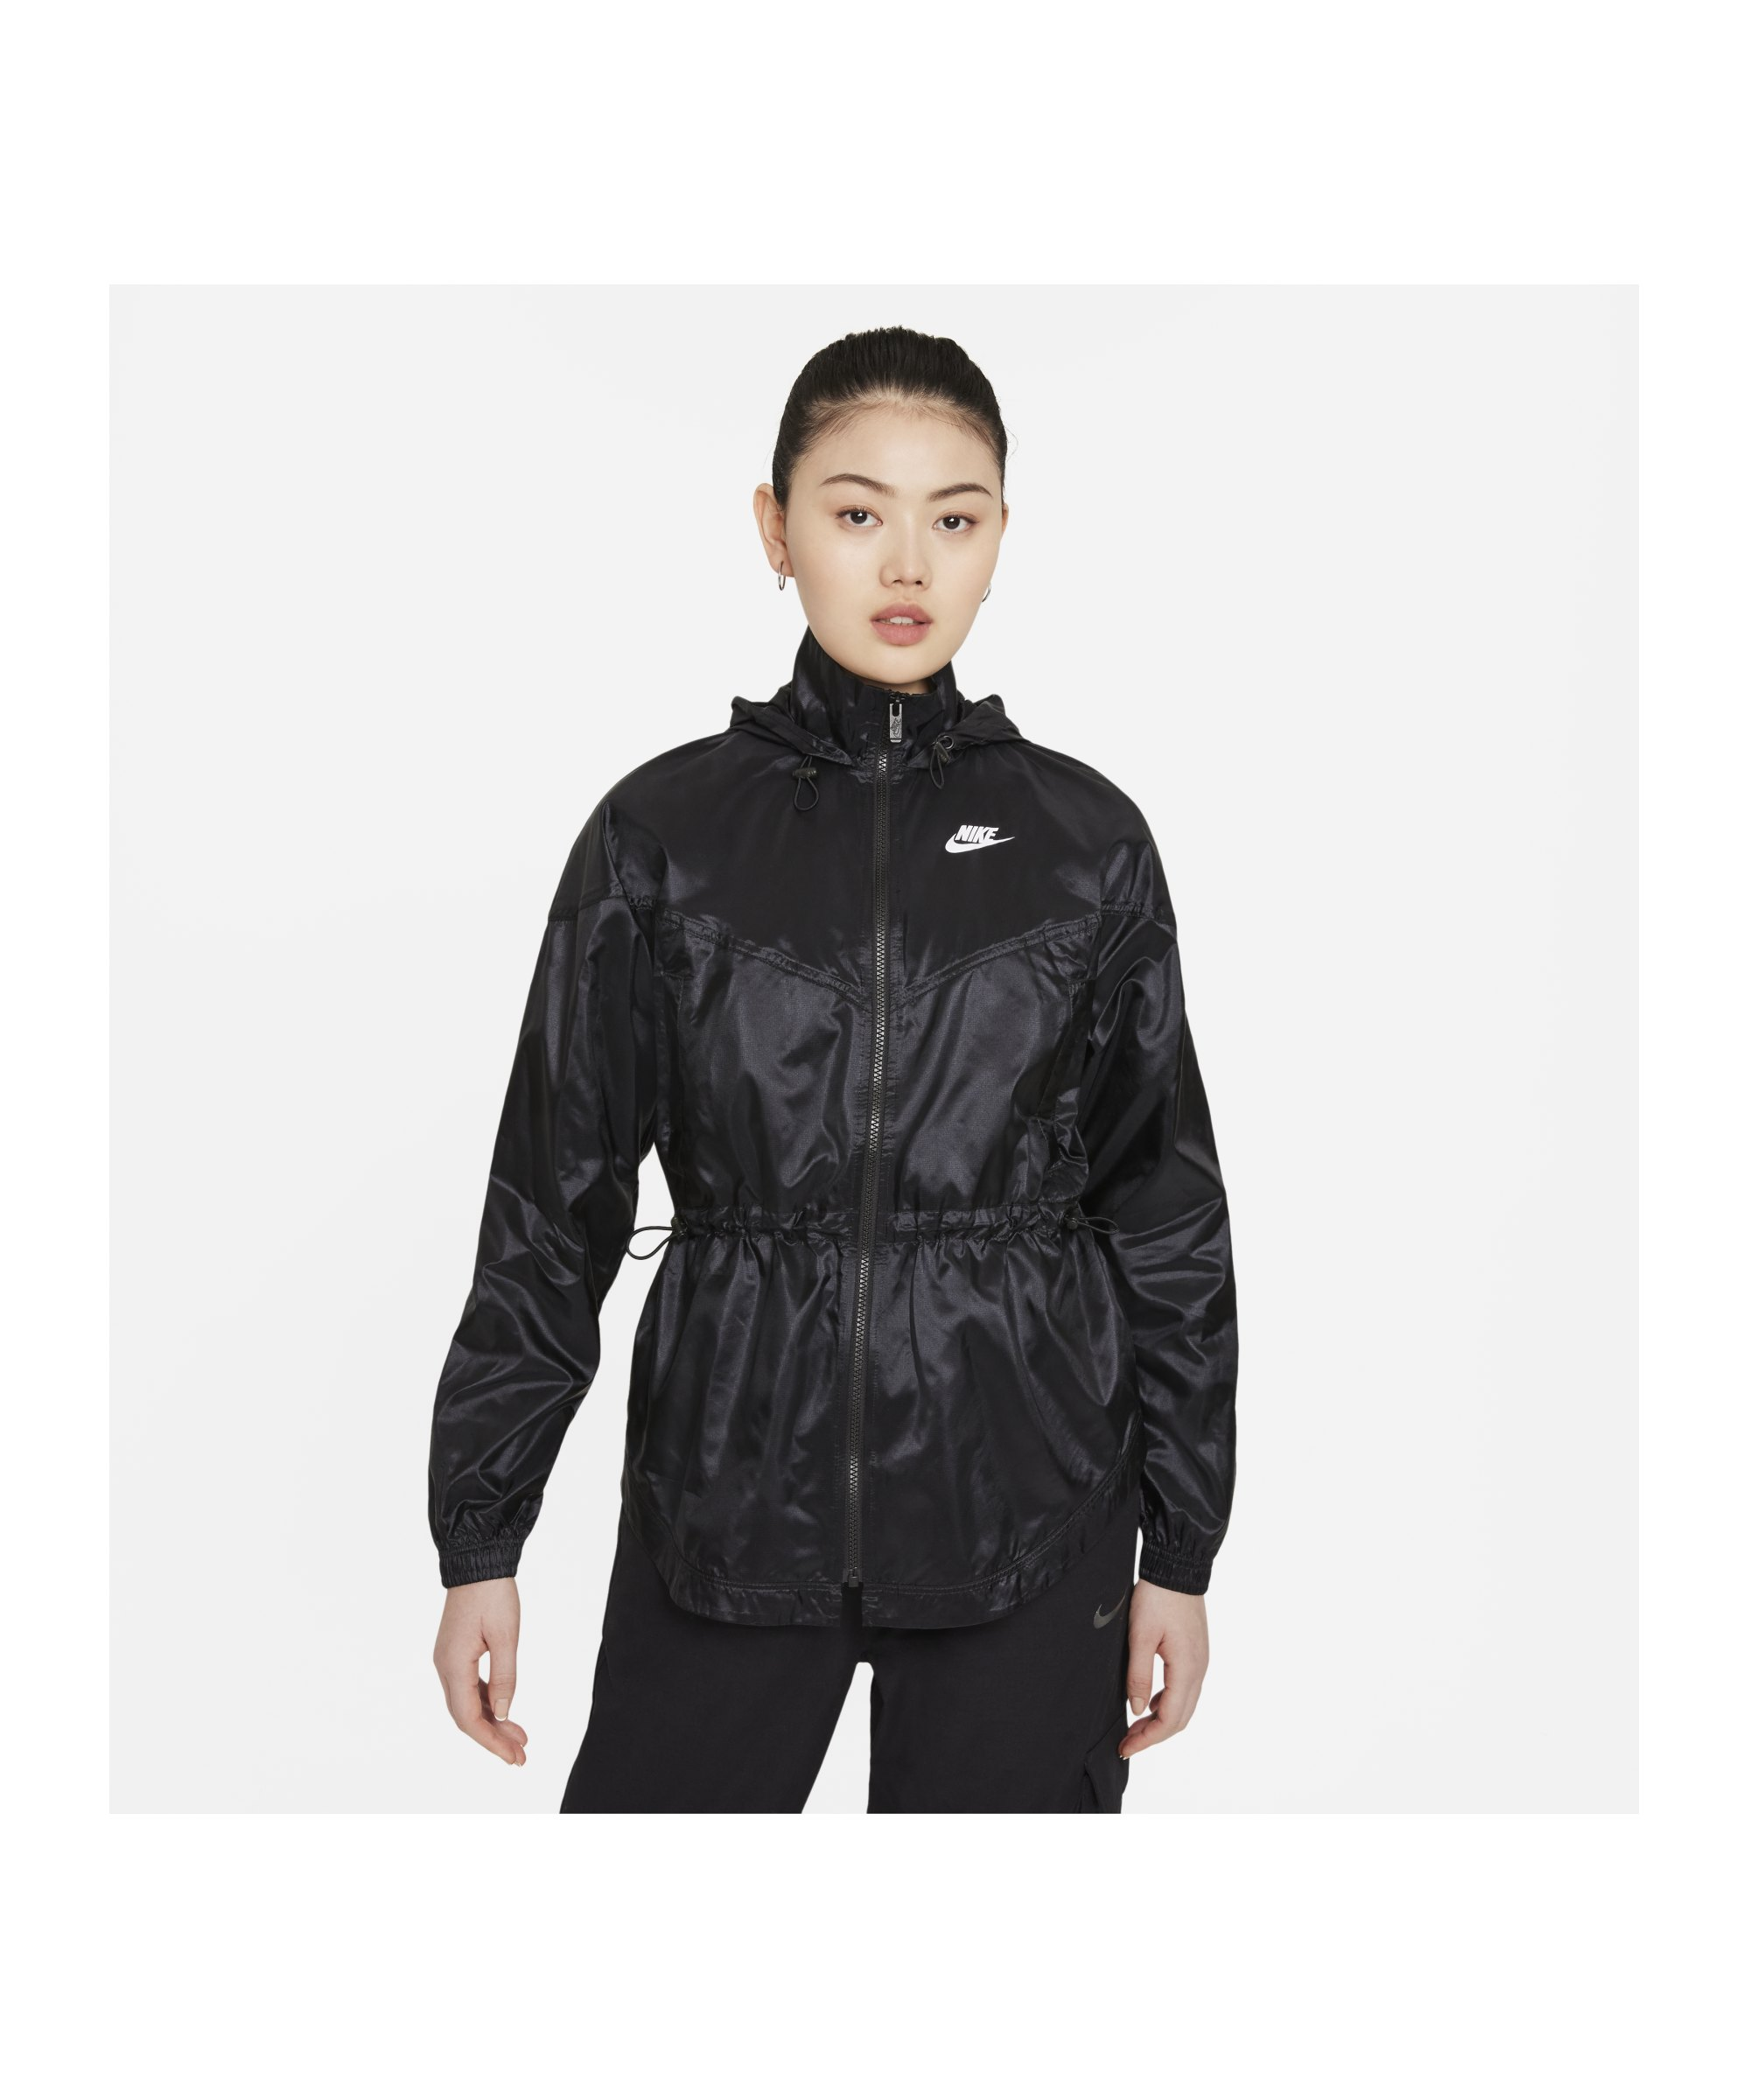 Nike Windrunner Jacke Damen Schwarz F010 - schwarz